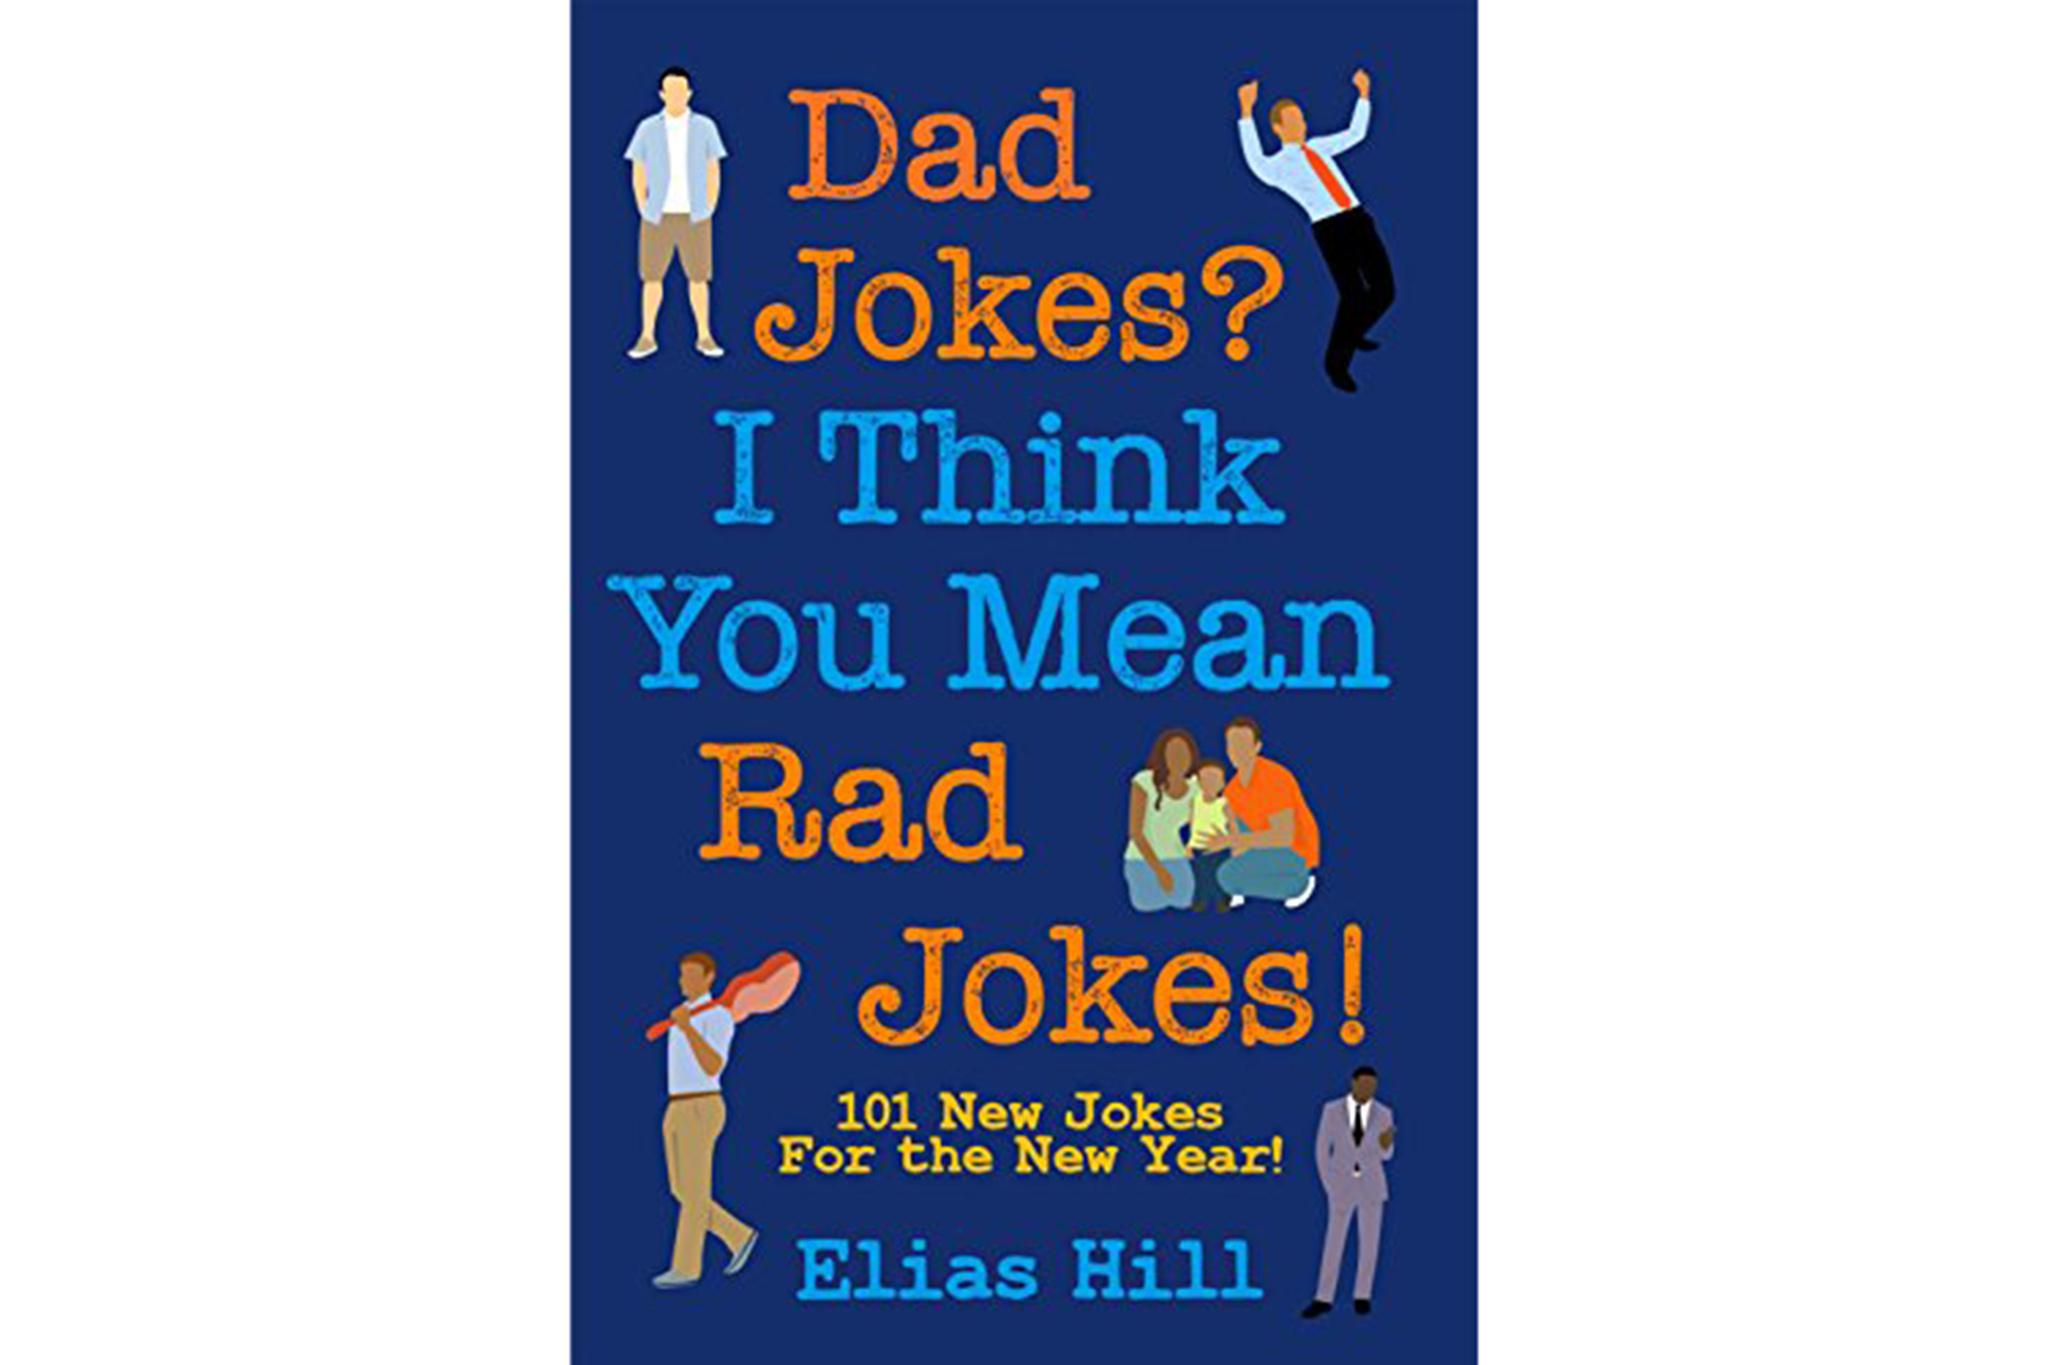 Dad joke book